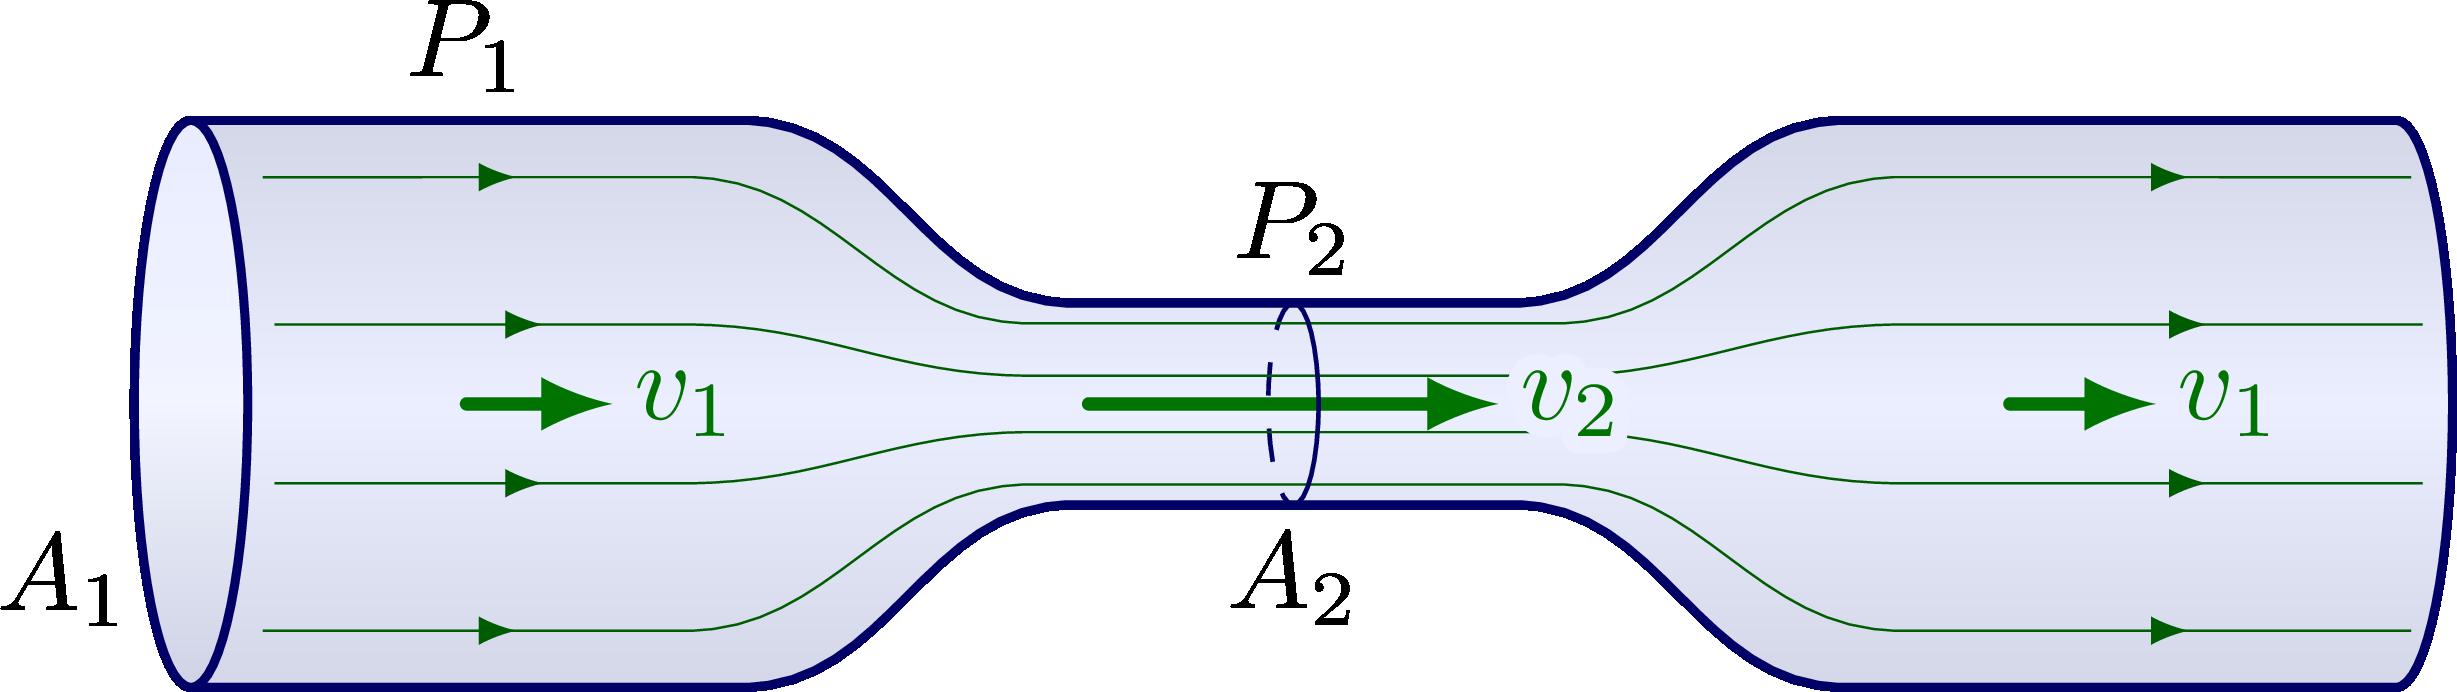 fluid_dynamics_bernouilli-003.png